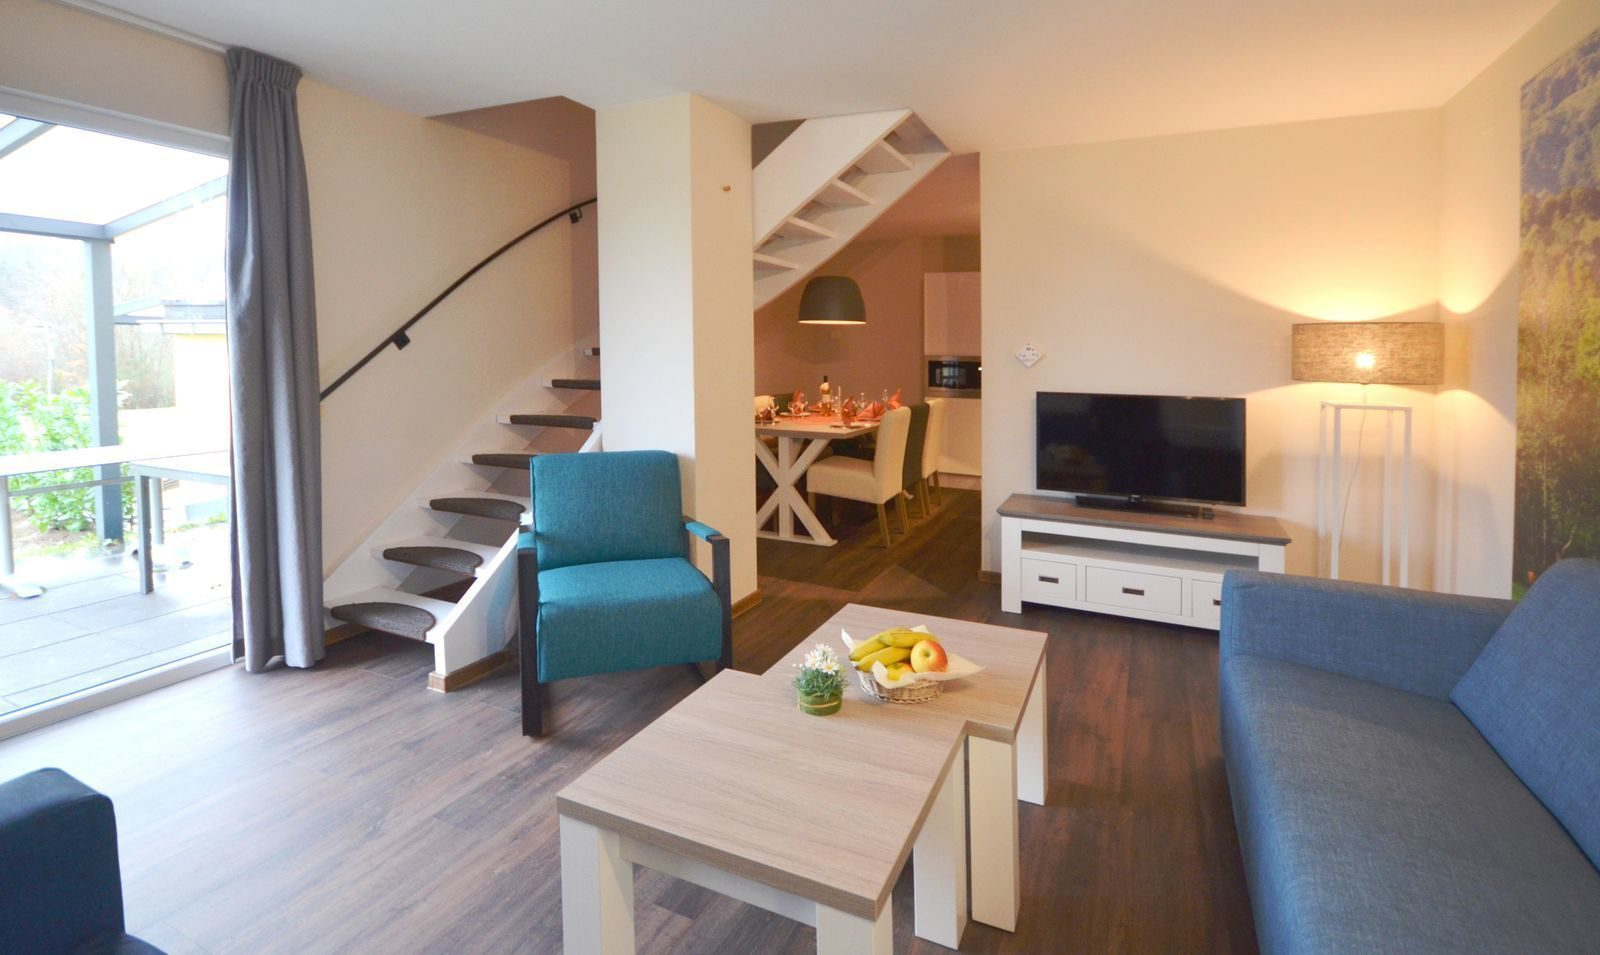 Haus inklusive Möbel